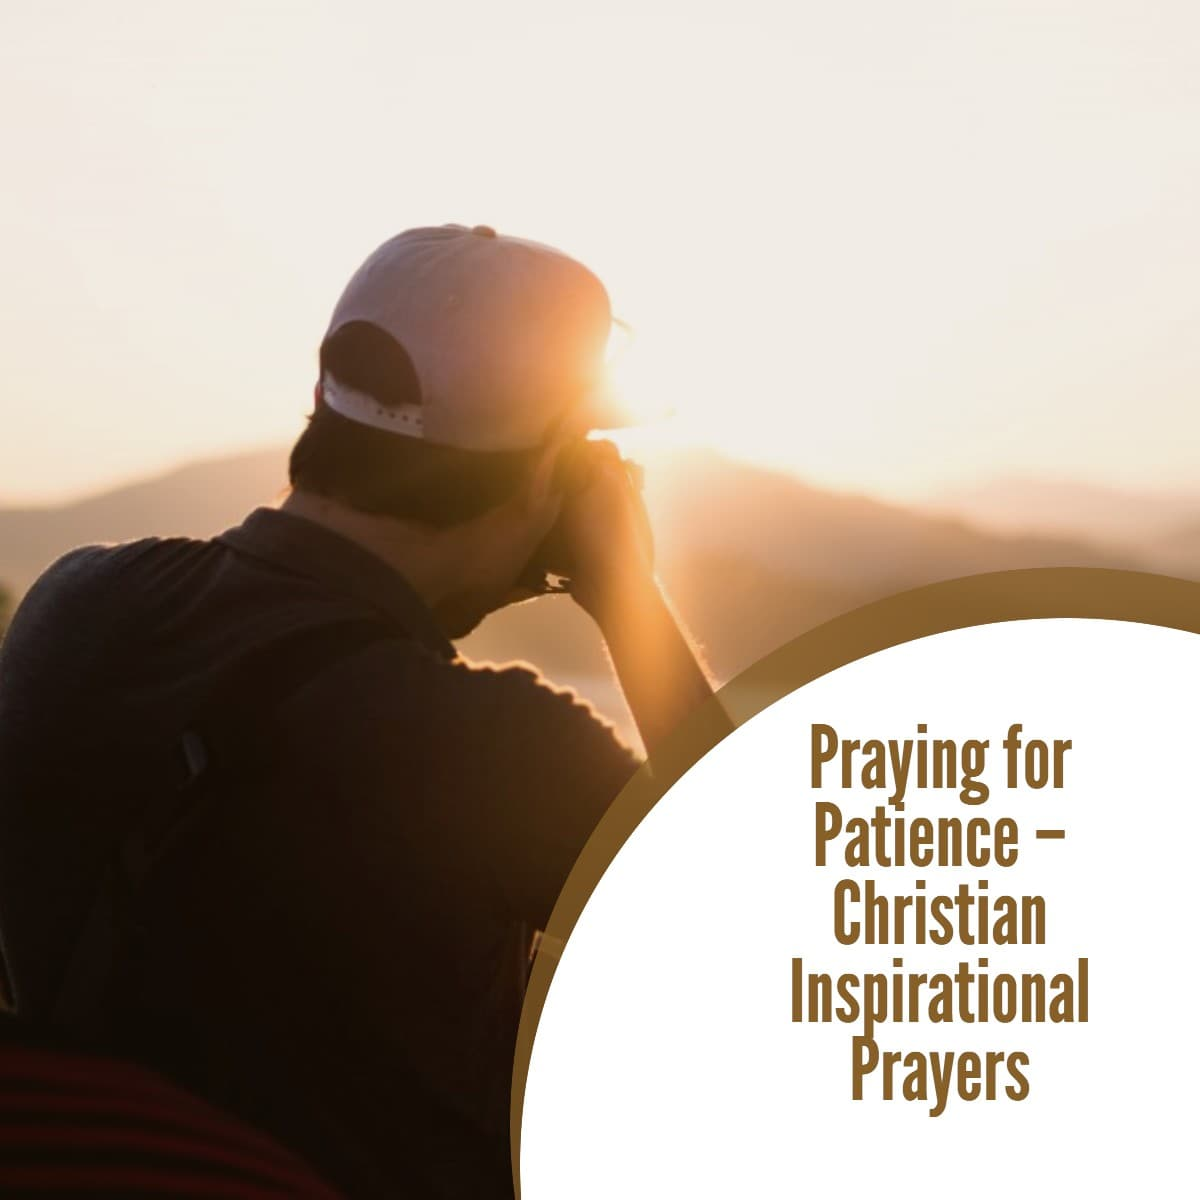 Praying for Patience – Christian Inspirational Prayers